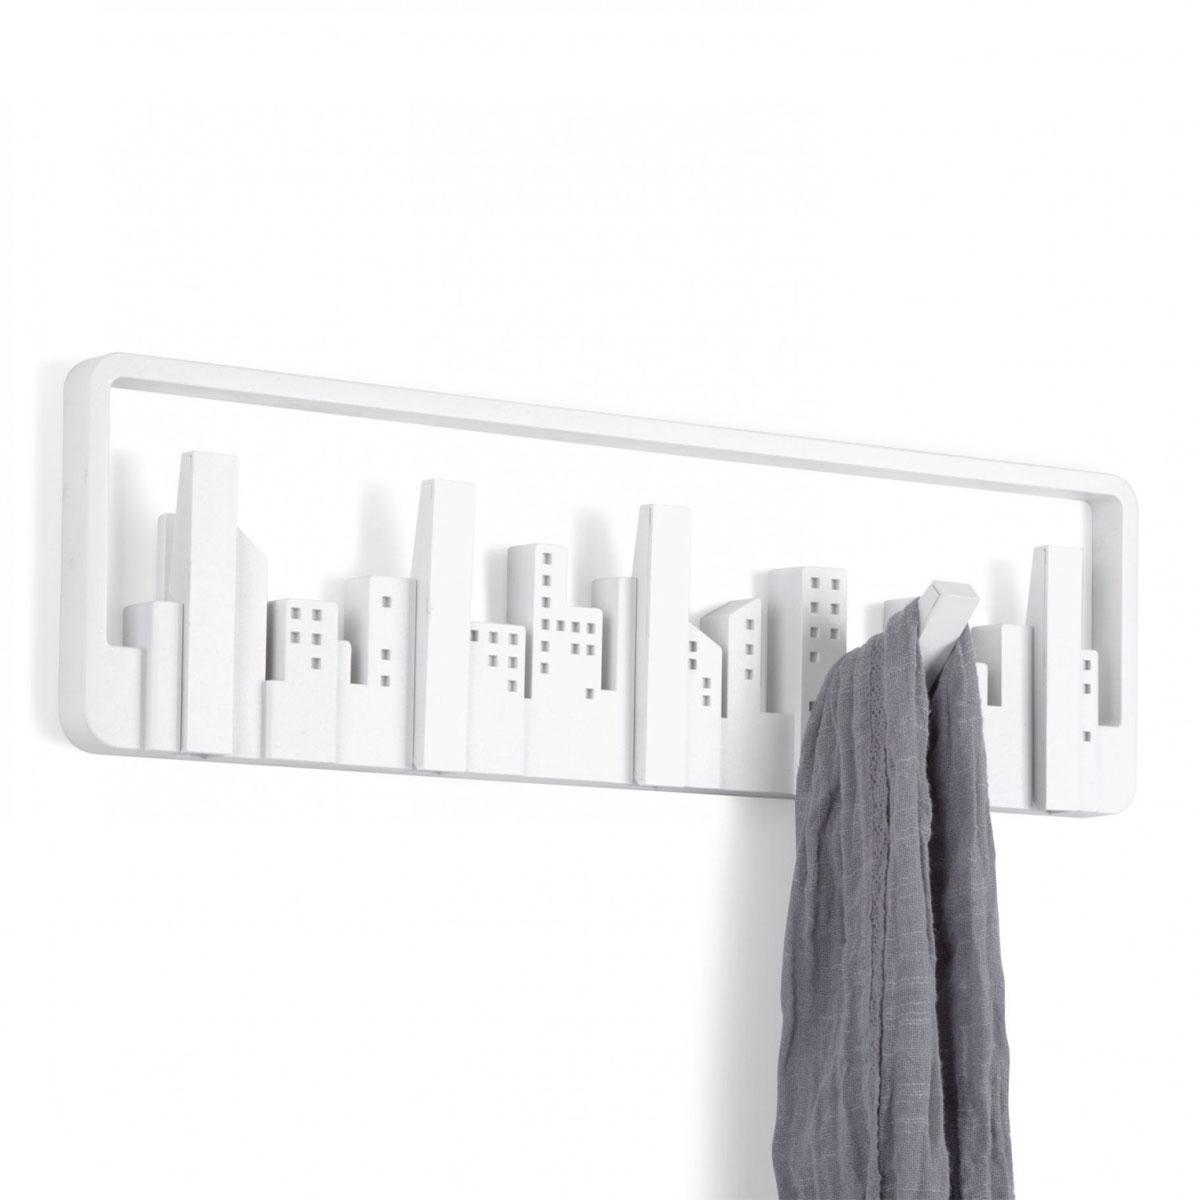 Вешалка настенная Umbra Skyline, цвет: белый, 5 крючков